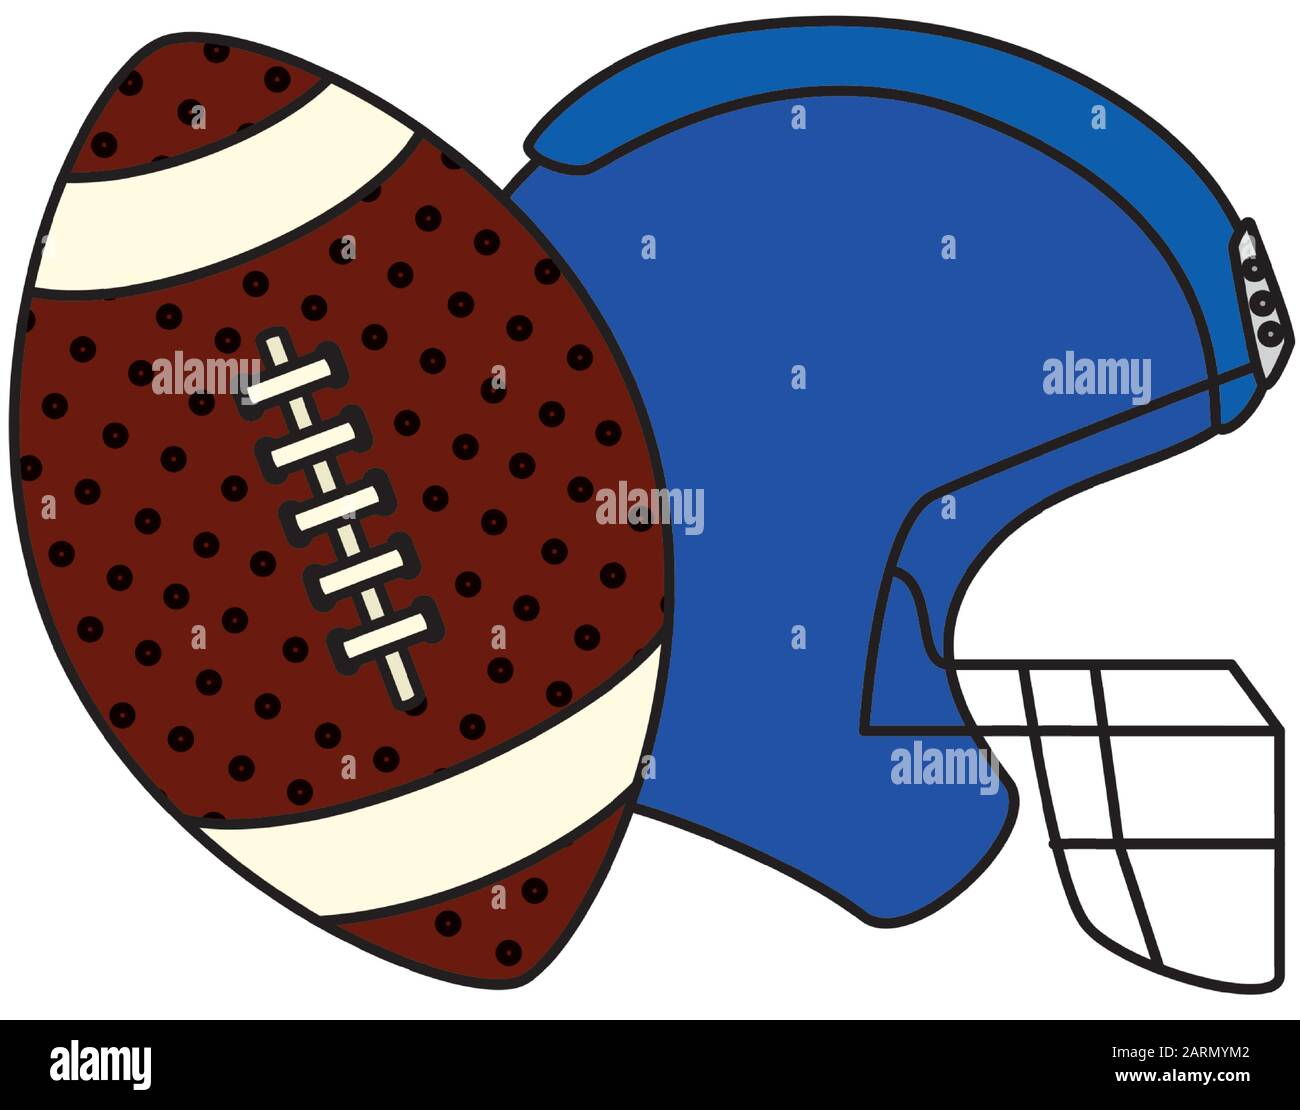 Ball And American Football Helmet Isolated Icon Stock Vector Image Art Alamy